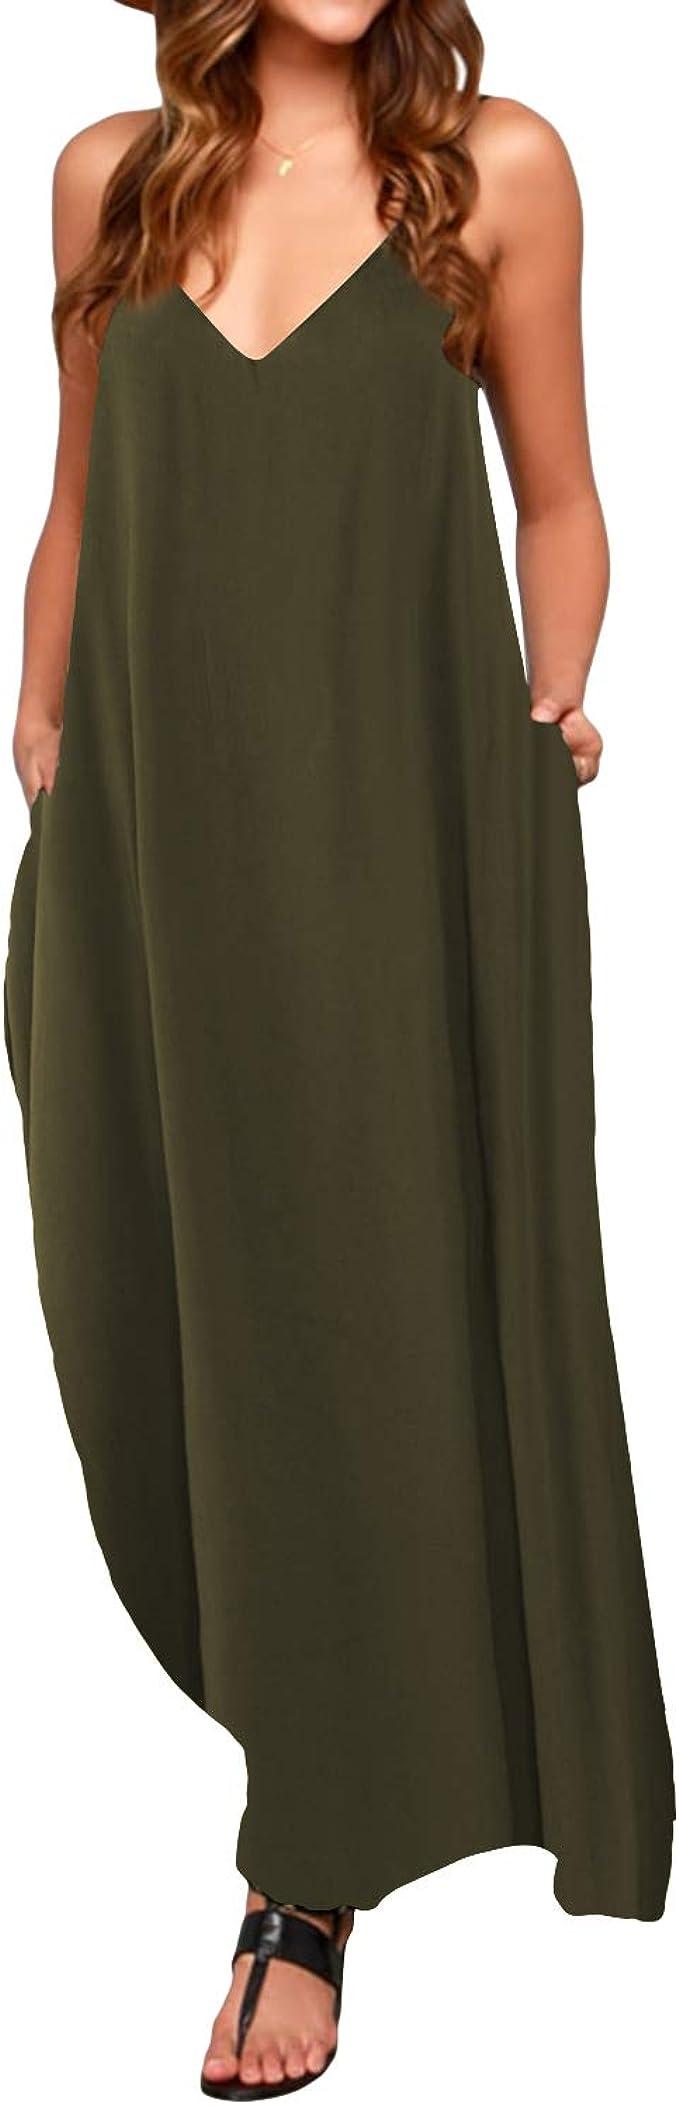 TALLA M. ACHIOOWA Mujer Vestido Elegante Casual Dress Cuello V Sin Manga Playa Tirantes Bolsillos Punto Falda Larga Verde